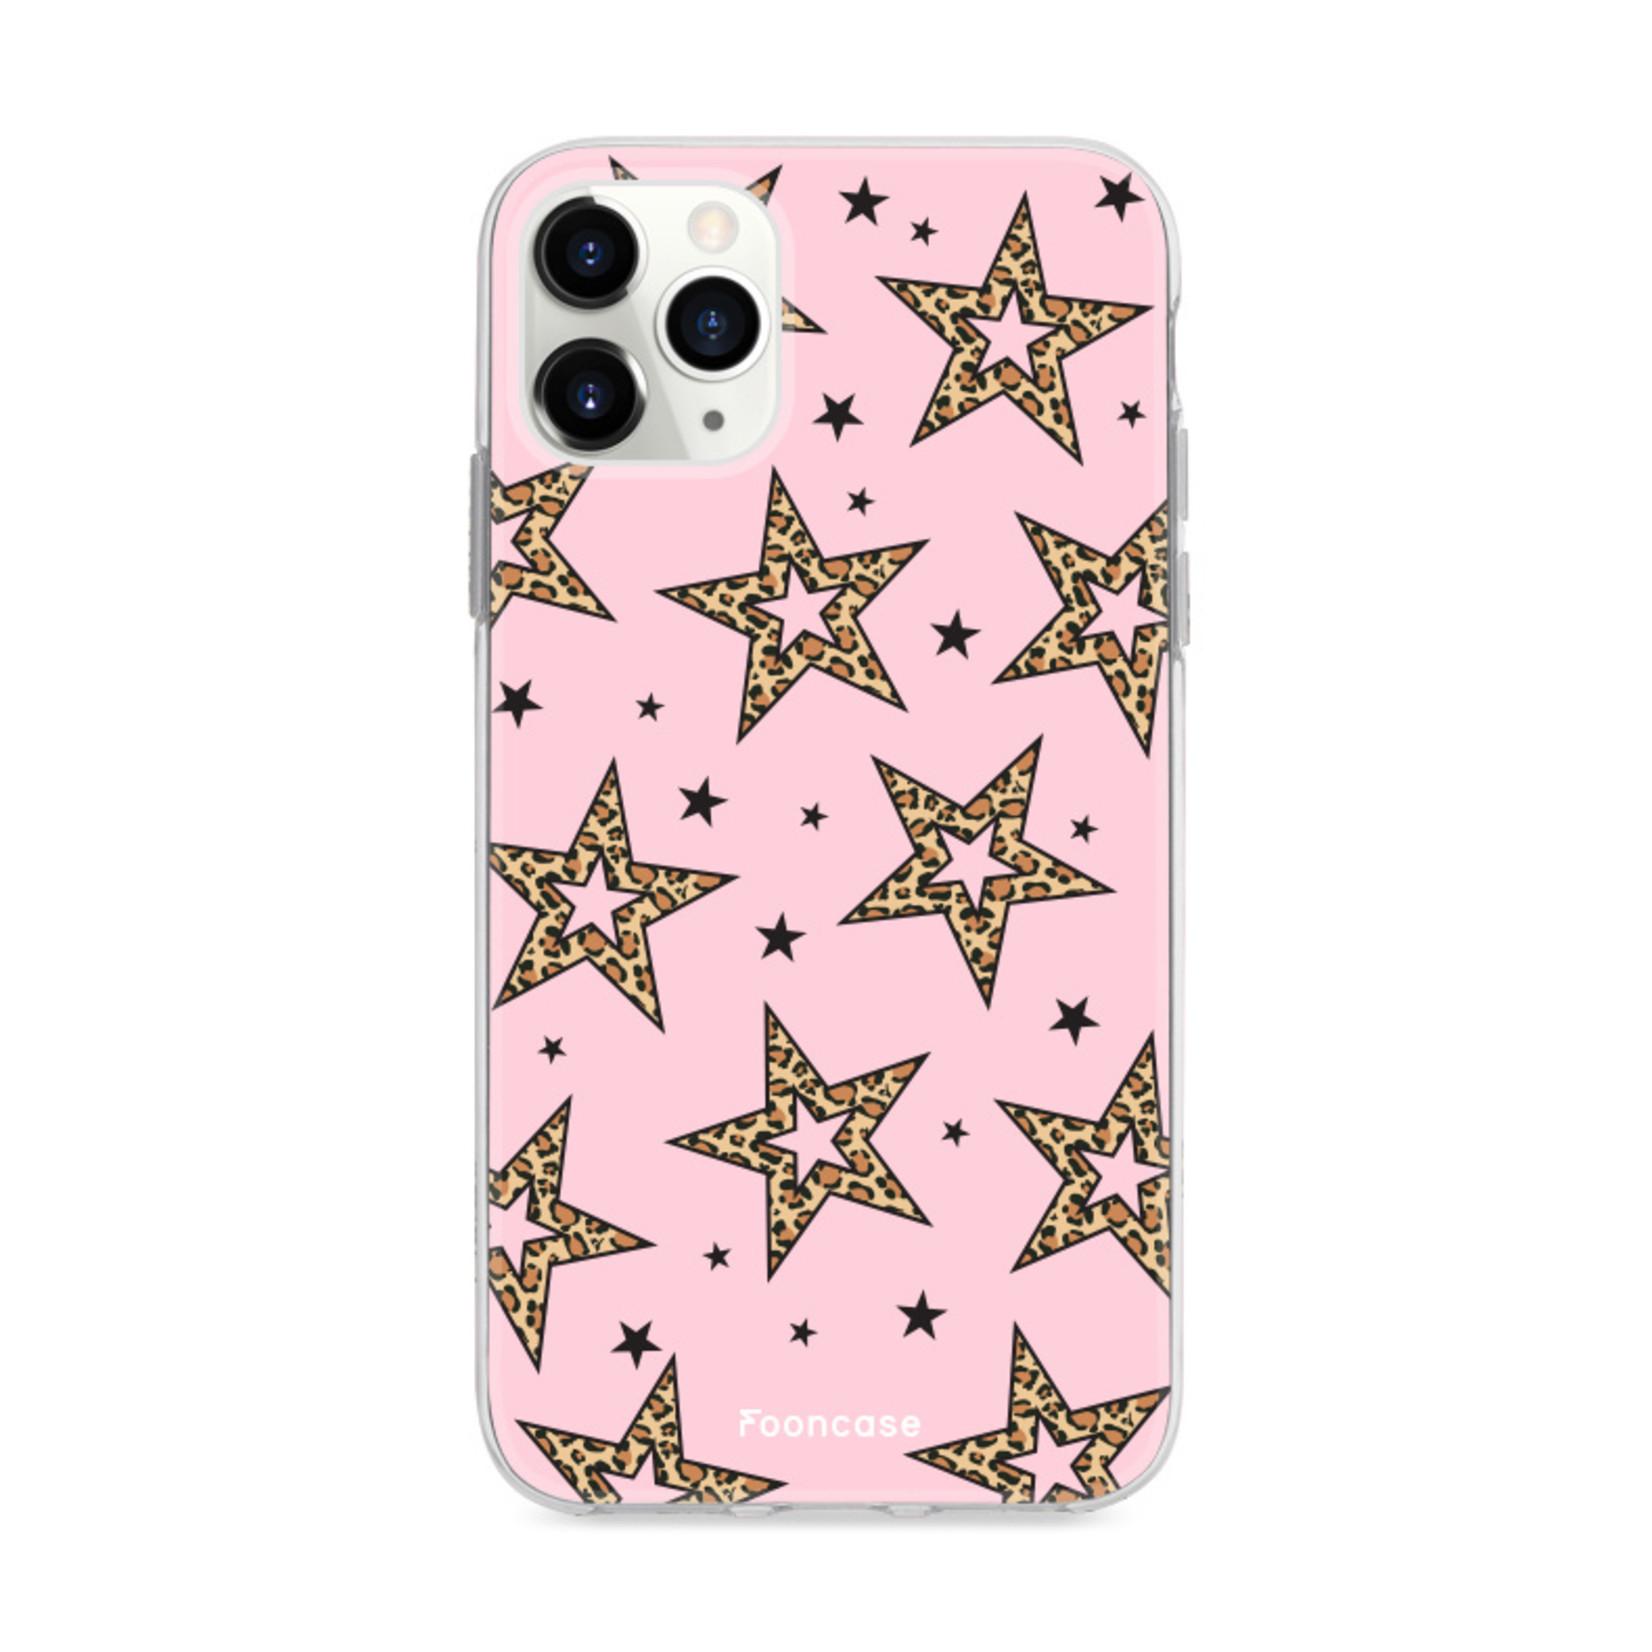 iPhone 12 Pro hoesje TPU Soft Case - Back Cover - Rebell Leopard Sterren Roze